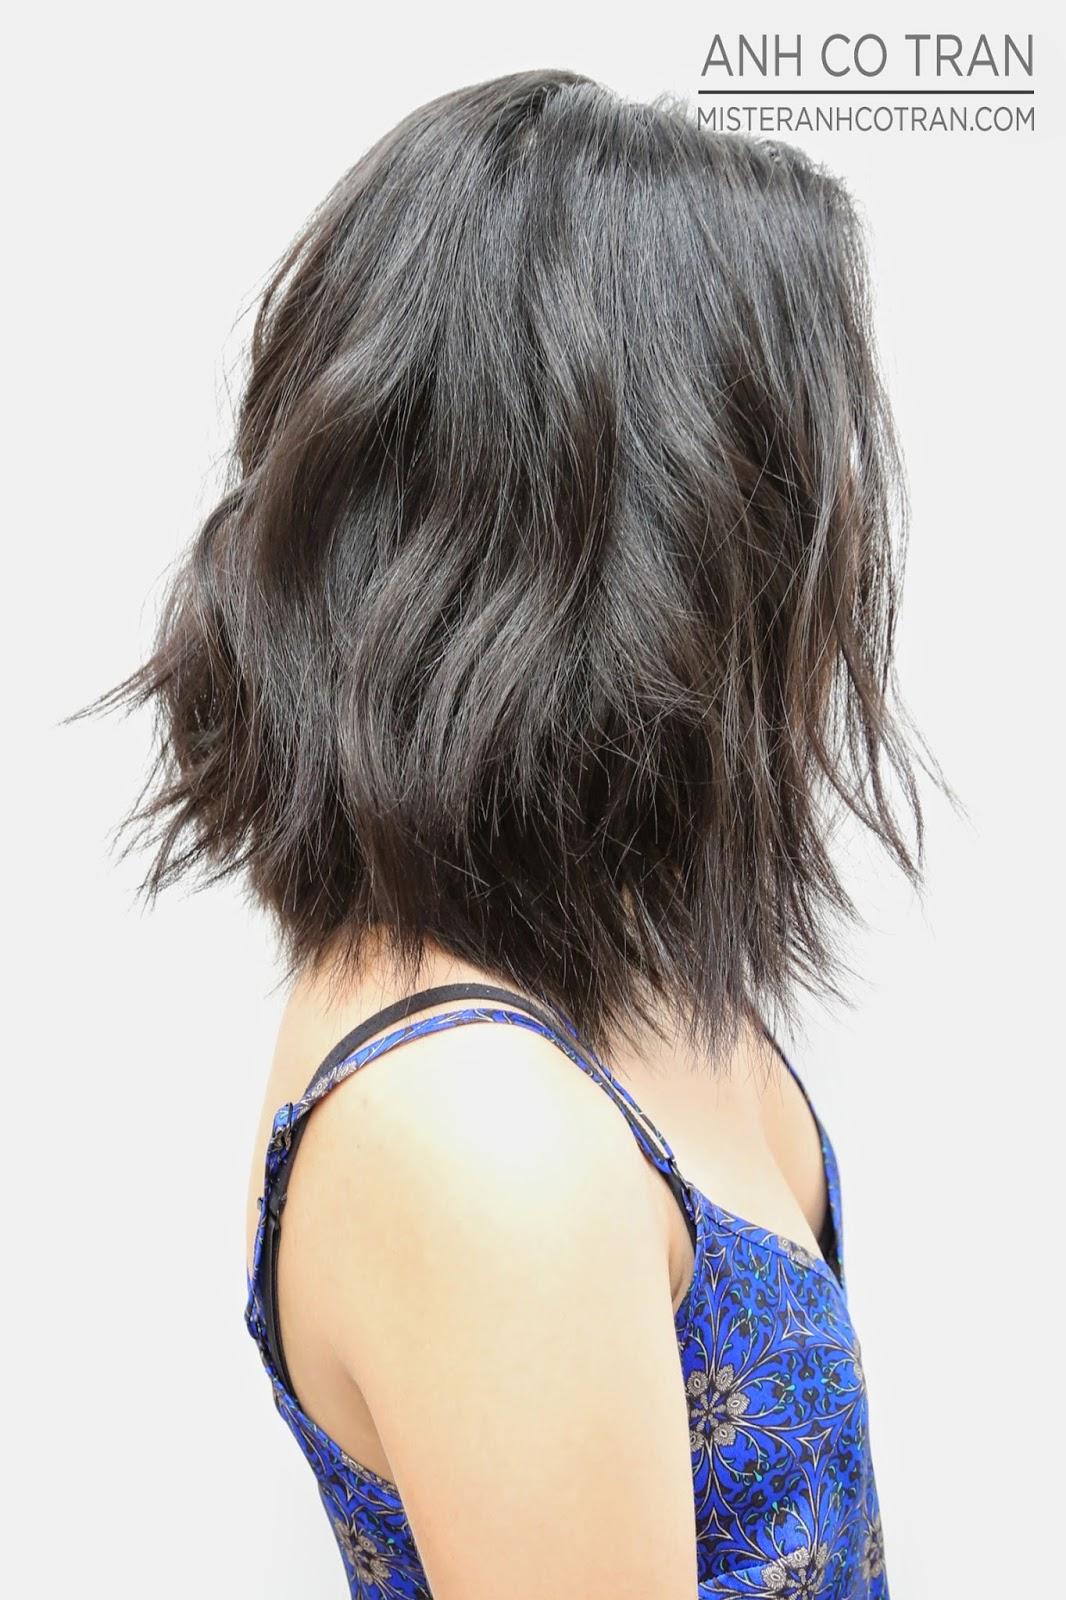 OFF WITH THE HAIR SOFT A LINE UNDERCUT AT RAMIREZTRAN